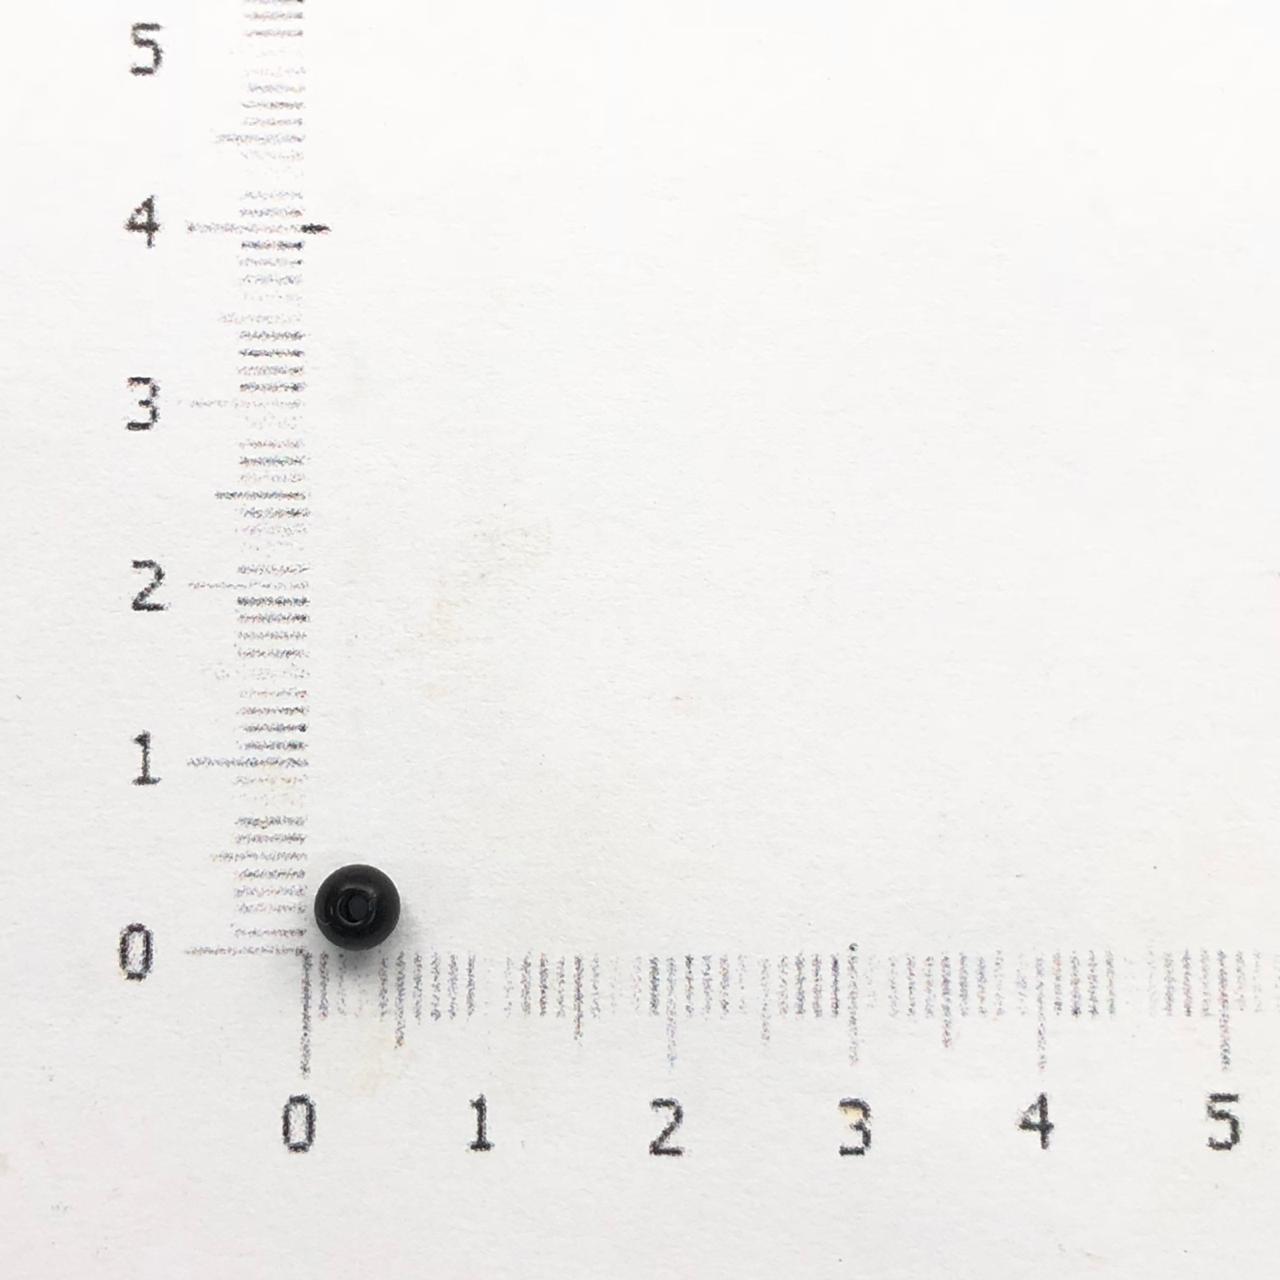 PE46 - Pérola de Resina 4m Preto - 10Grs